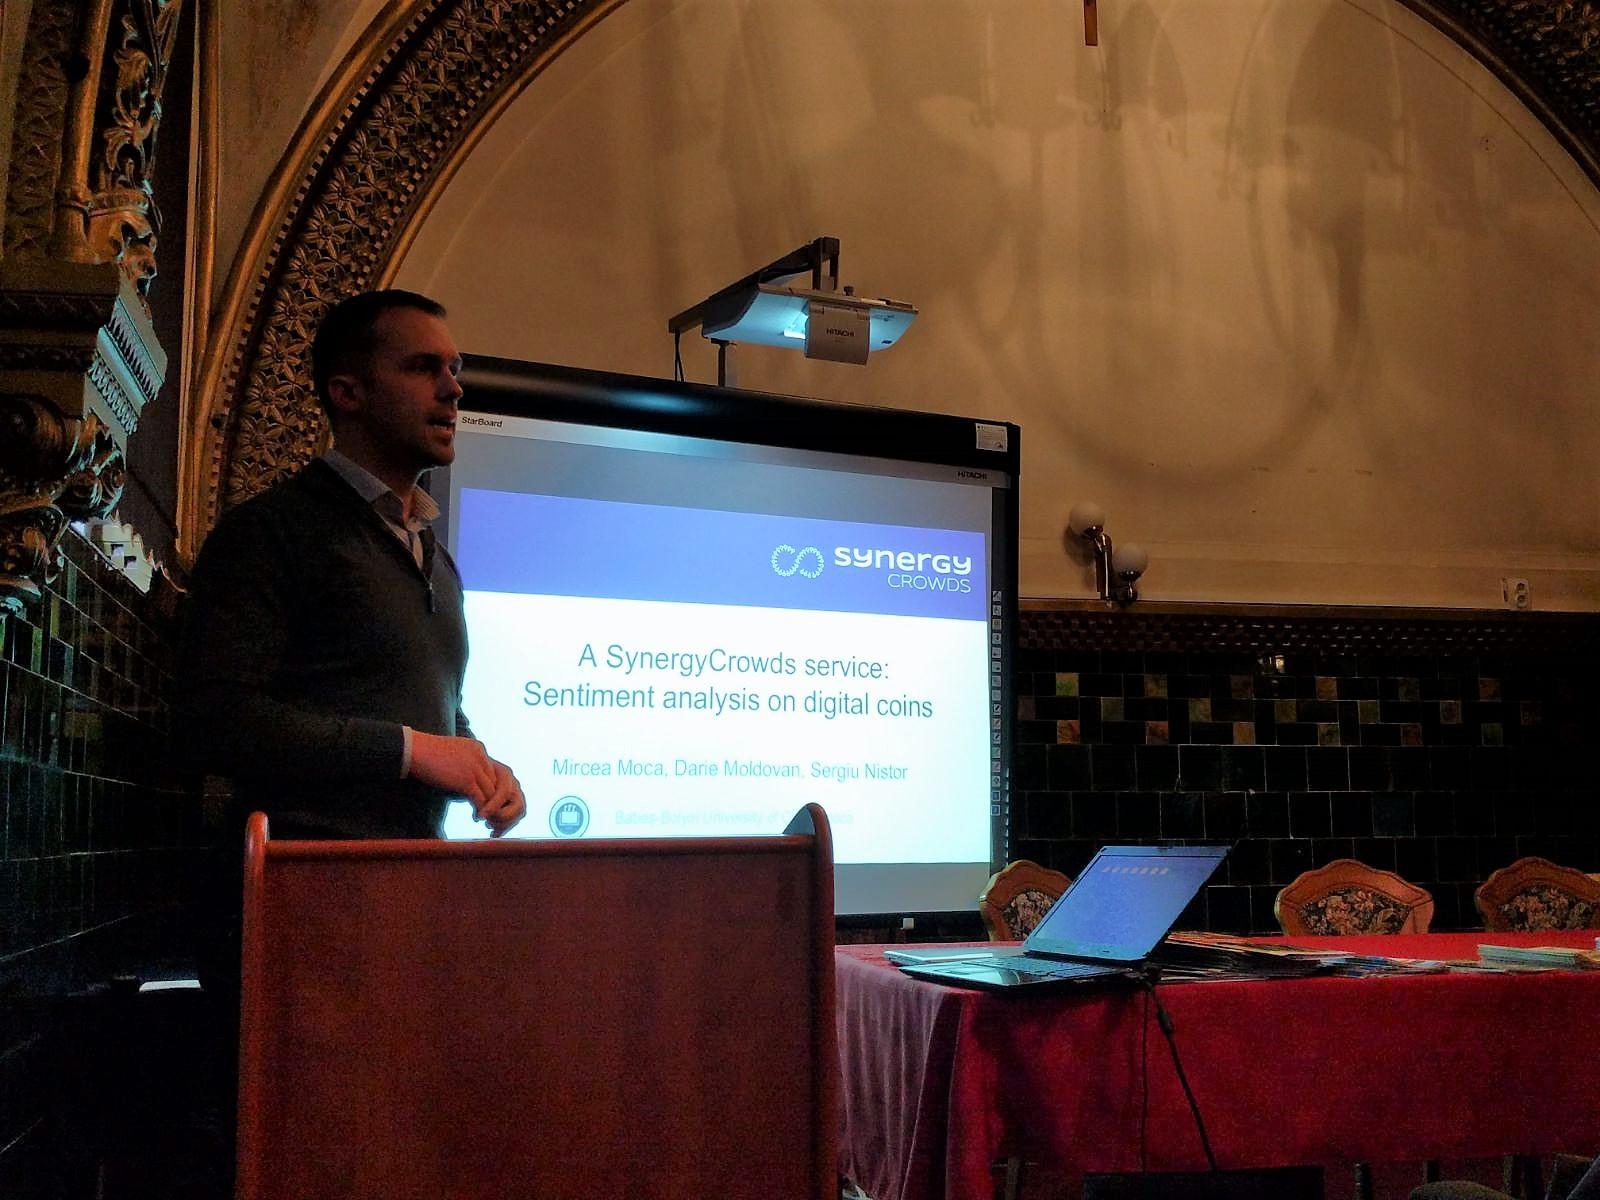 Mircea Moca SynergyCrowds - DigiHubb 2017